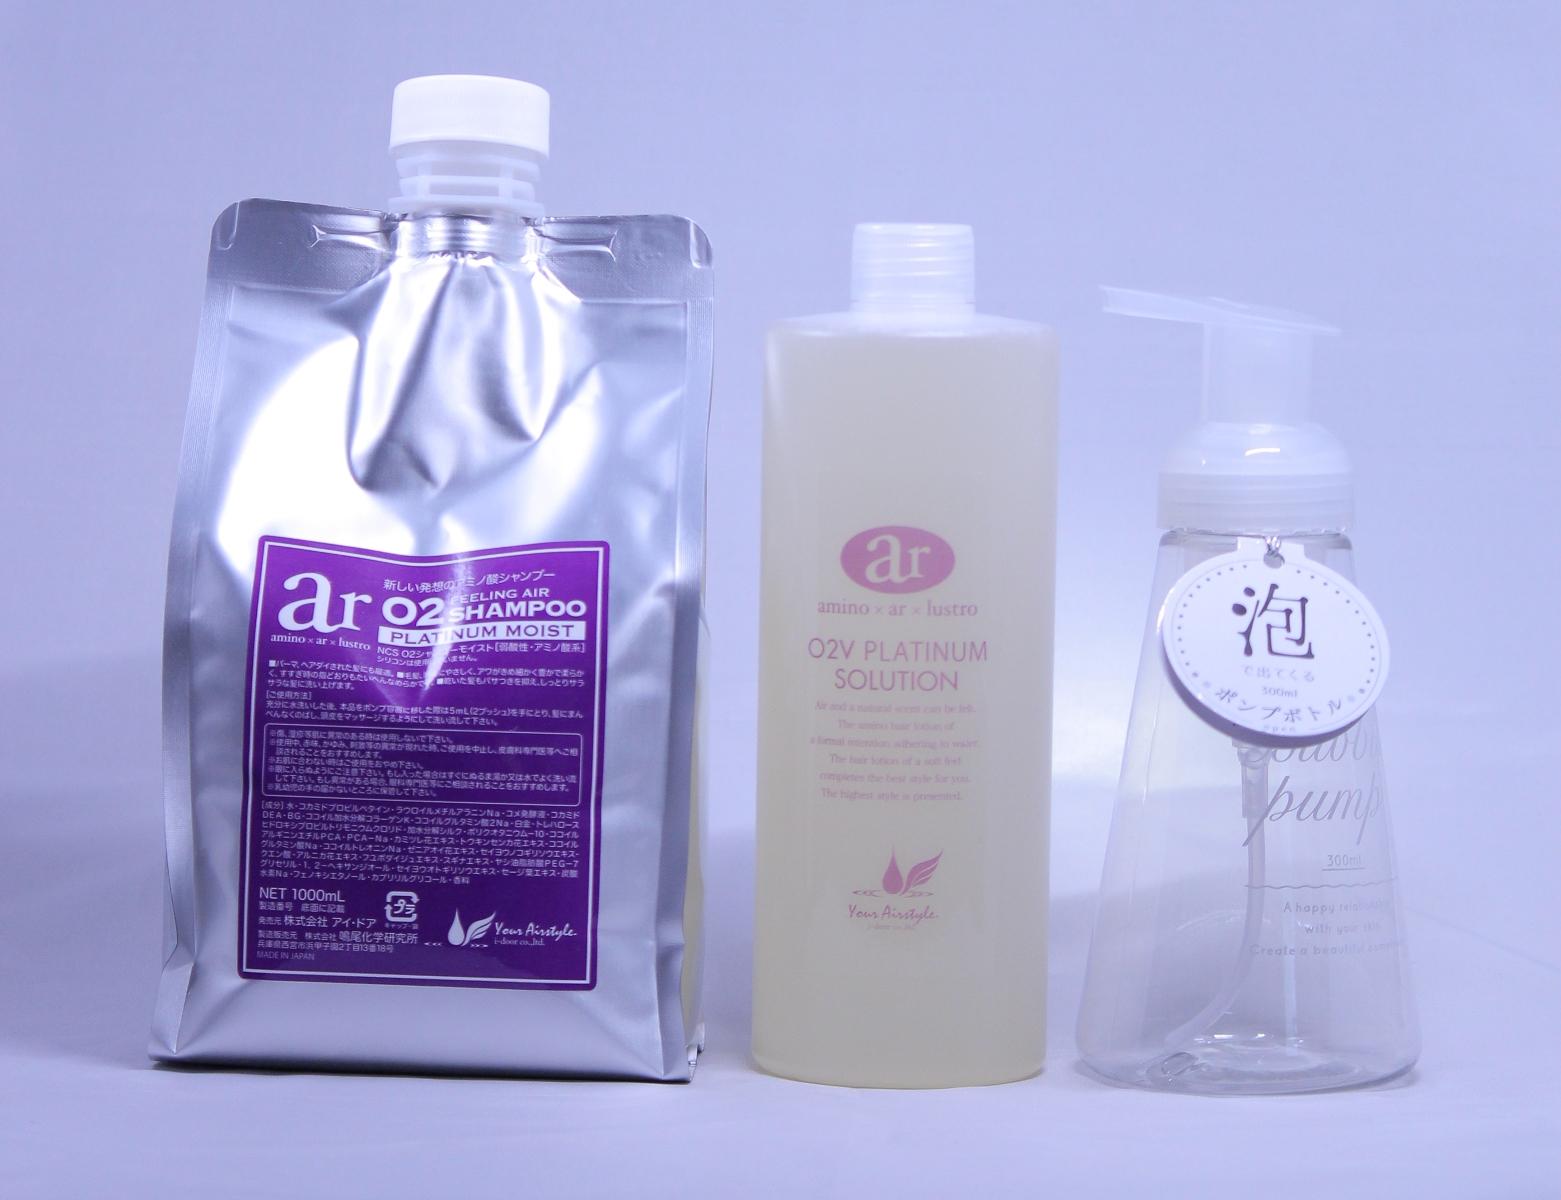 [i-door] ar O2シャンプー プラチナモイスト1000ml&O2Vソリューション500ml[液体トリートメント][カラーの色が長持ち][髪質改善型タイプ][今ならポイント20倍][今ならムースポンプ付]